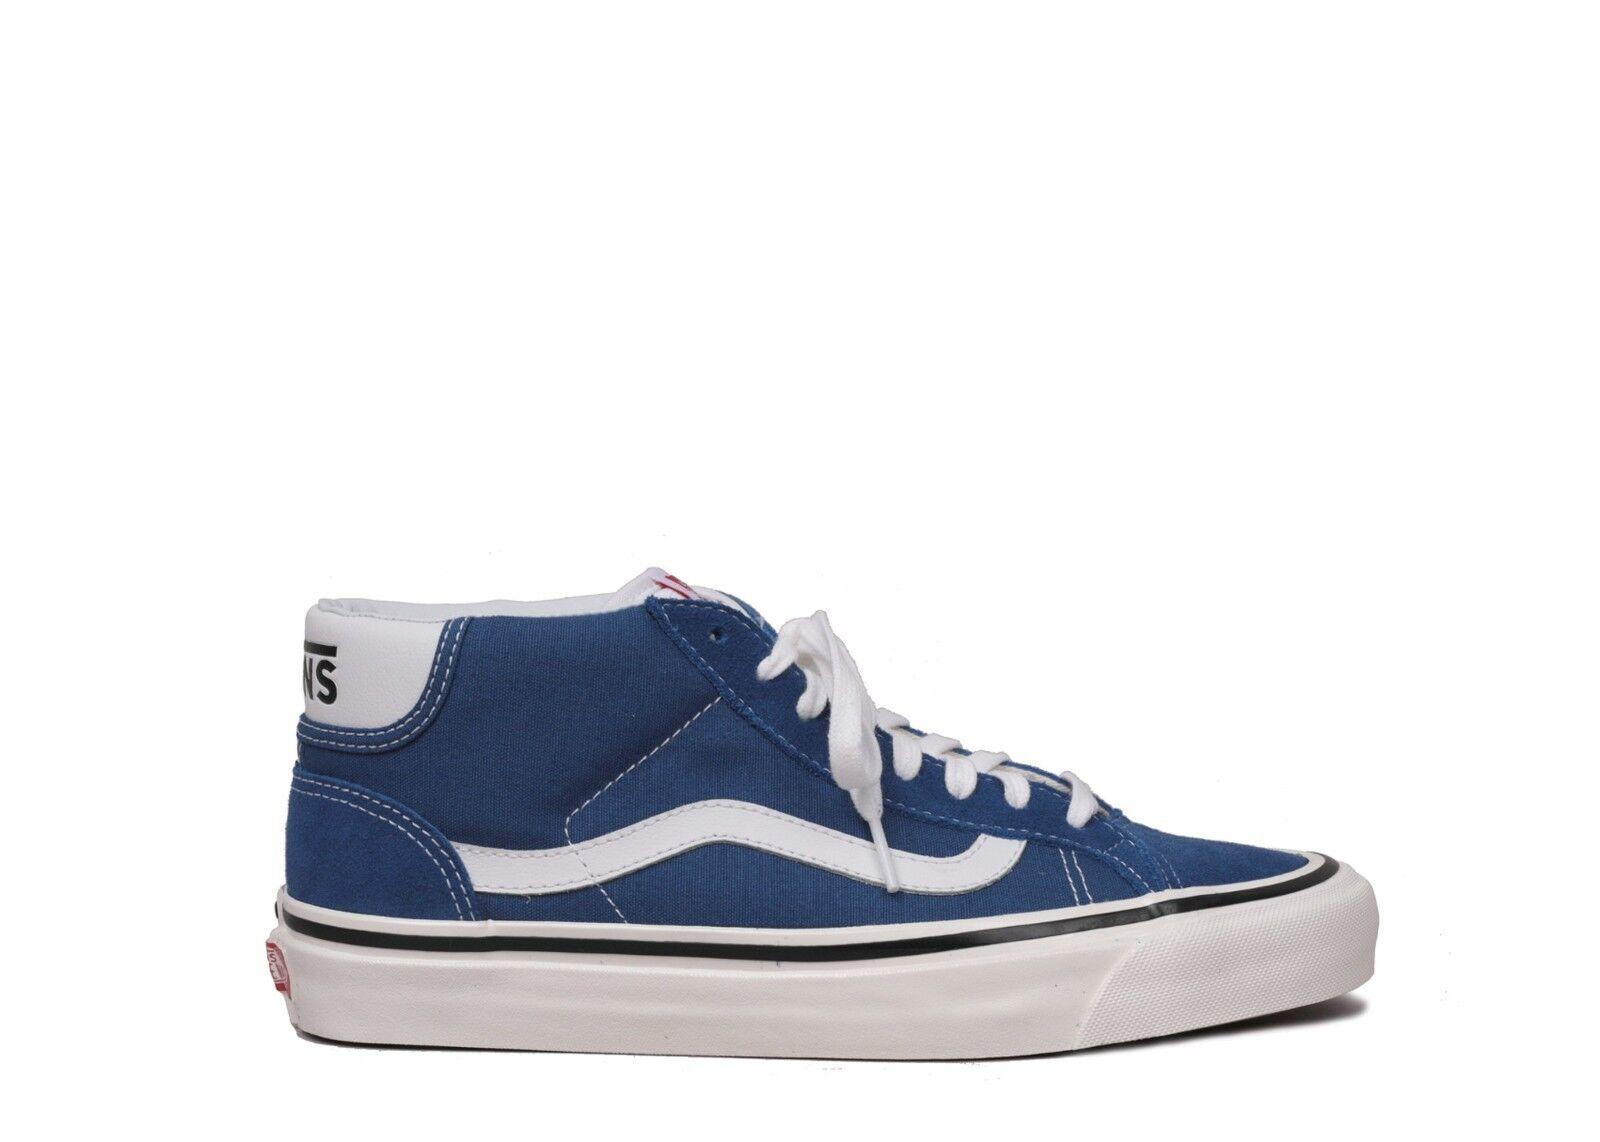 SALE  Uomo Vans Mid Factory Skool 37 DX Anaheim Factory Mid Blau Weiß SZ 6-13 NEW db8c02